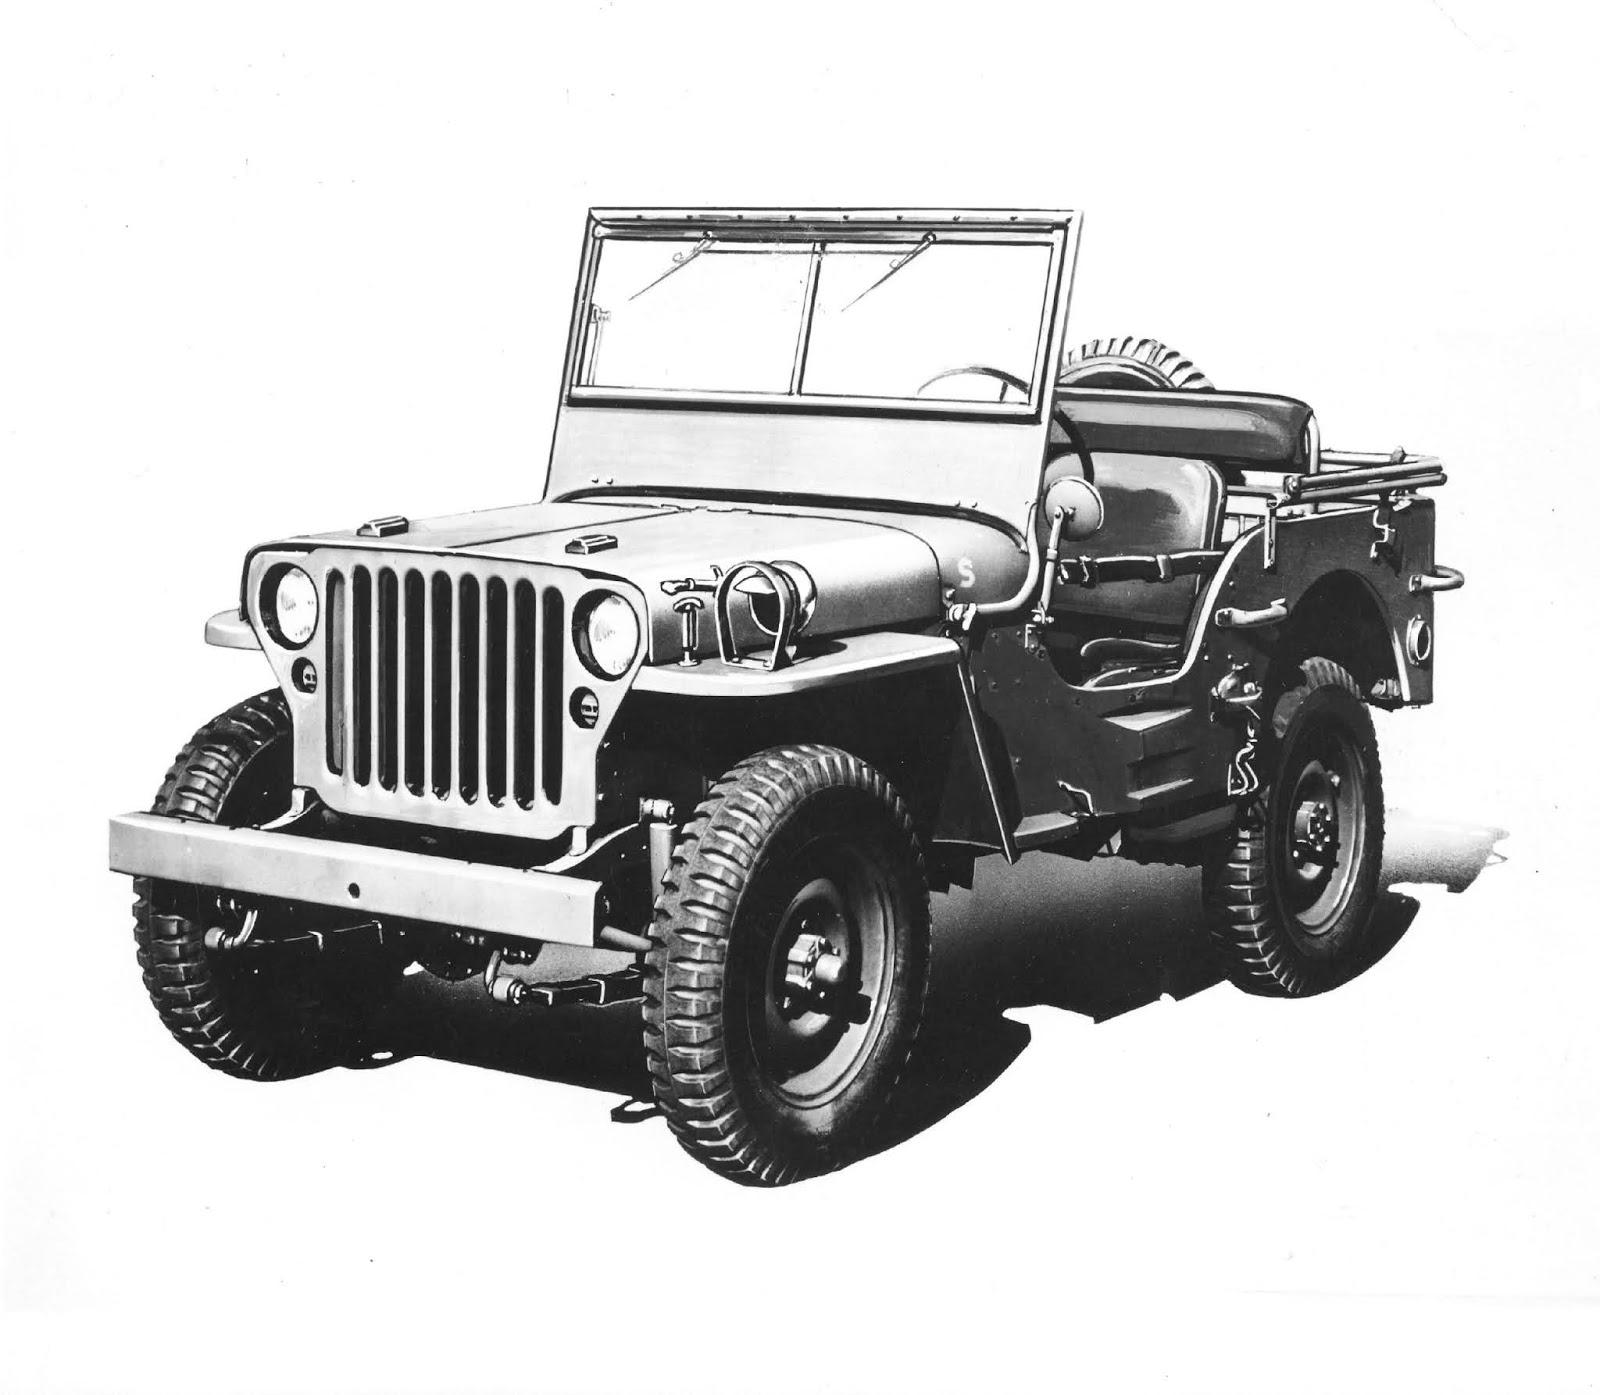 1944 Jeep Willys MB Πώς... βασάνισαν το Jeep Willy's μέχρι να φτάσει στην παραγωγή Jeep, Jeep Willys, video, videos, Willys, zblog, ειδήσεις, ιστορικα